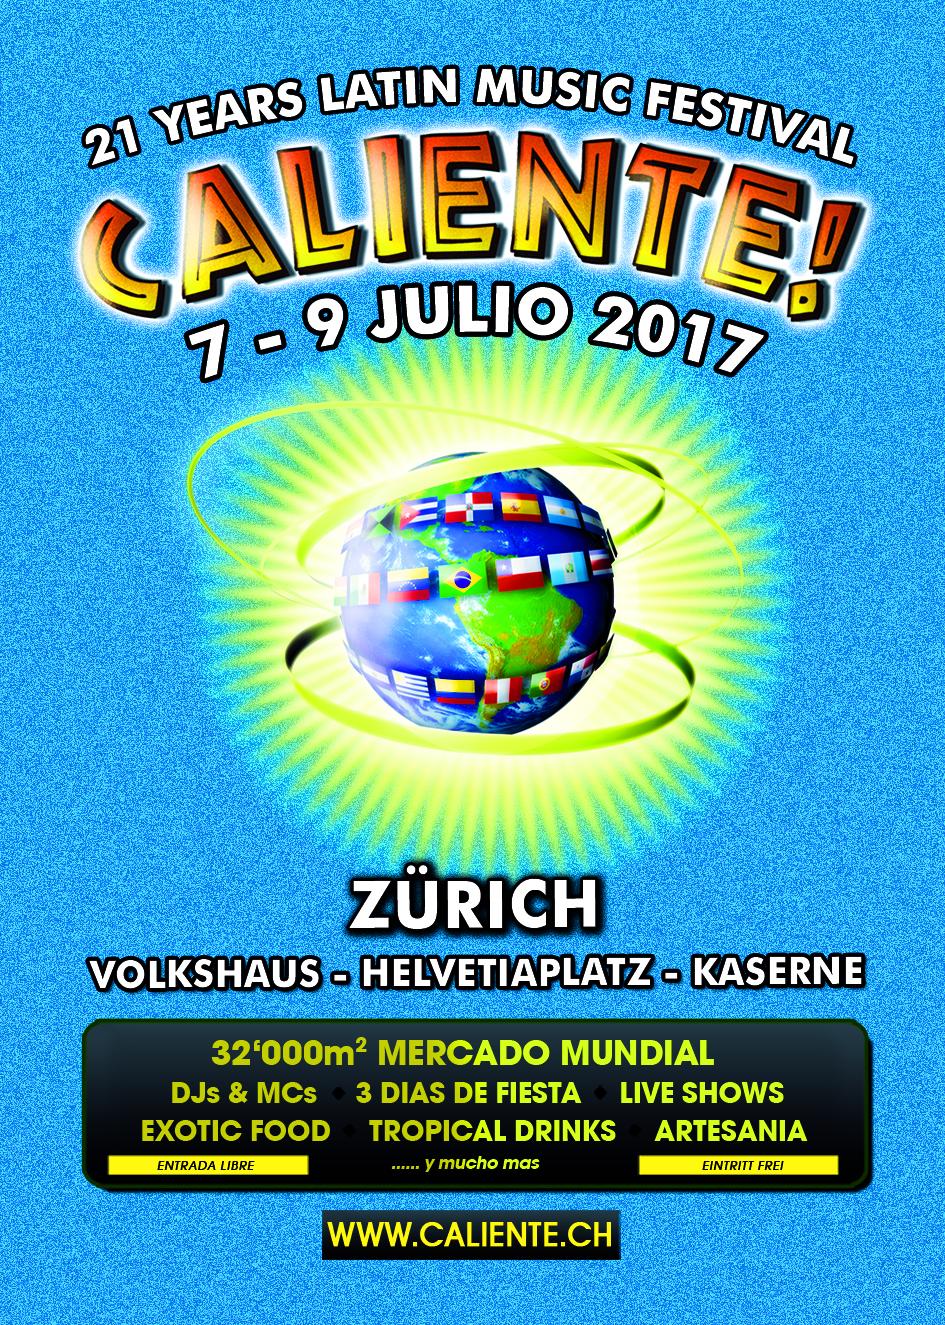 Caliente Festival 2017